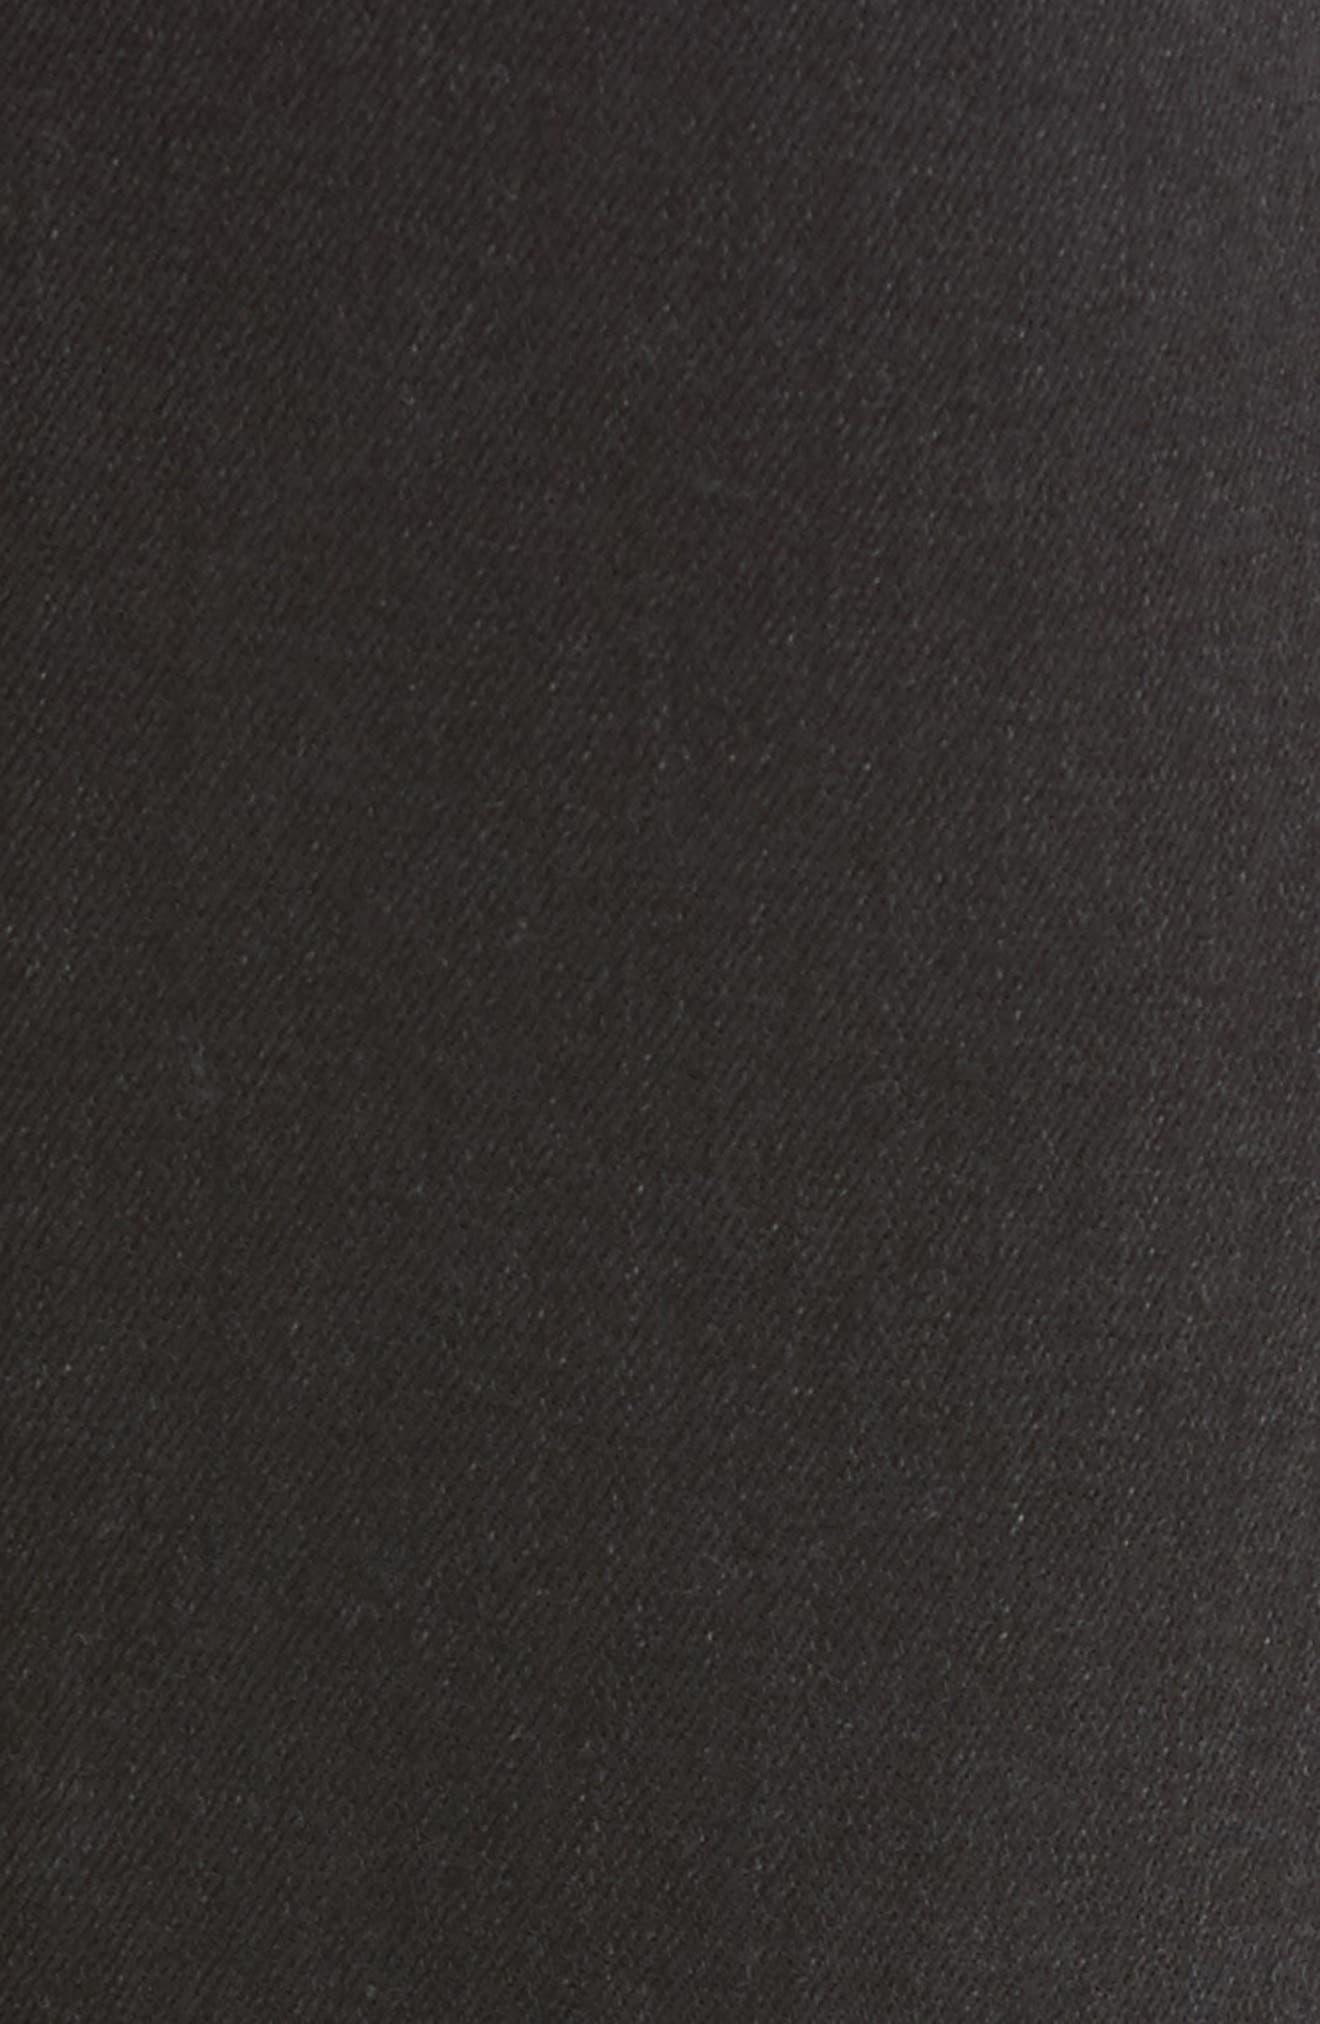 Transcend - Hoxton High Waist Ultra Skinny Jeans,                             Alternate thumbnail 6, color,                             Black Fog